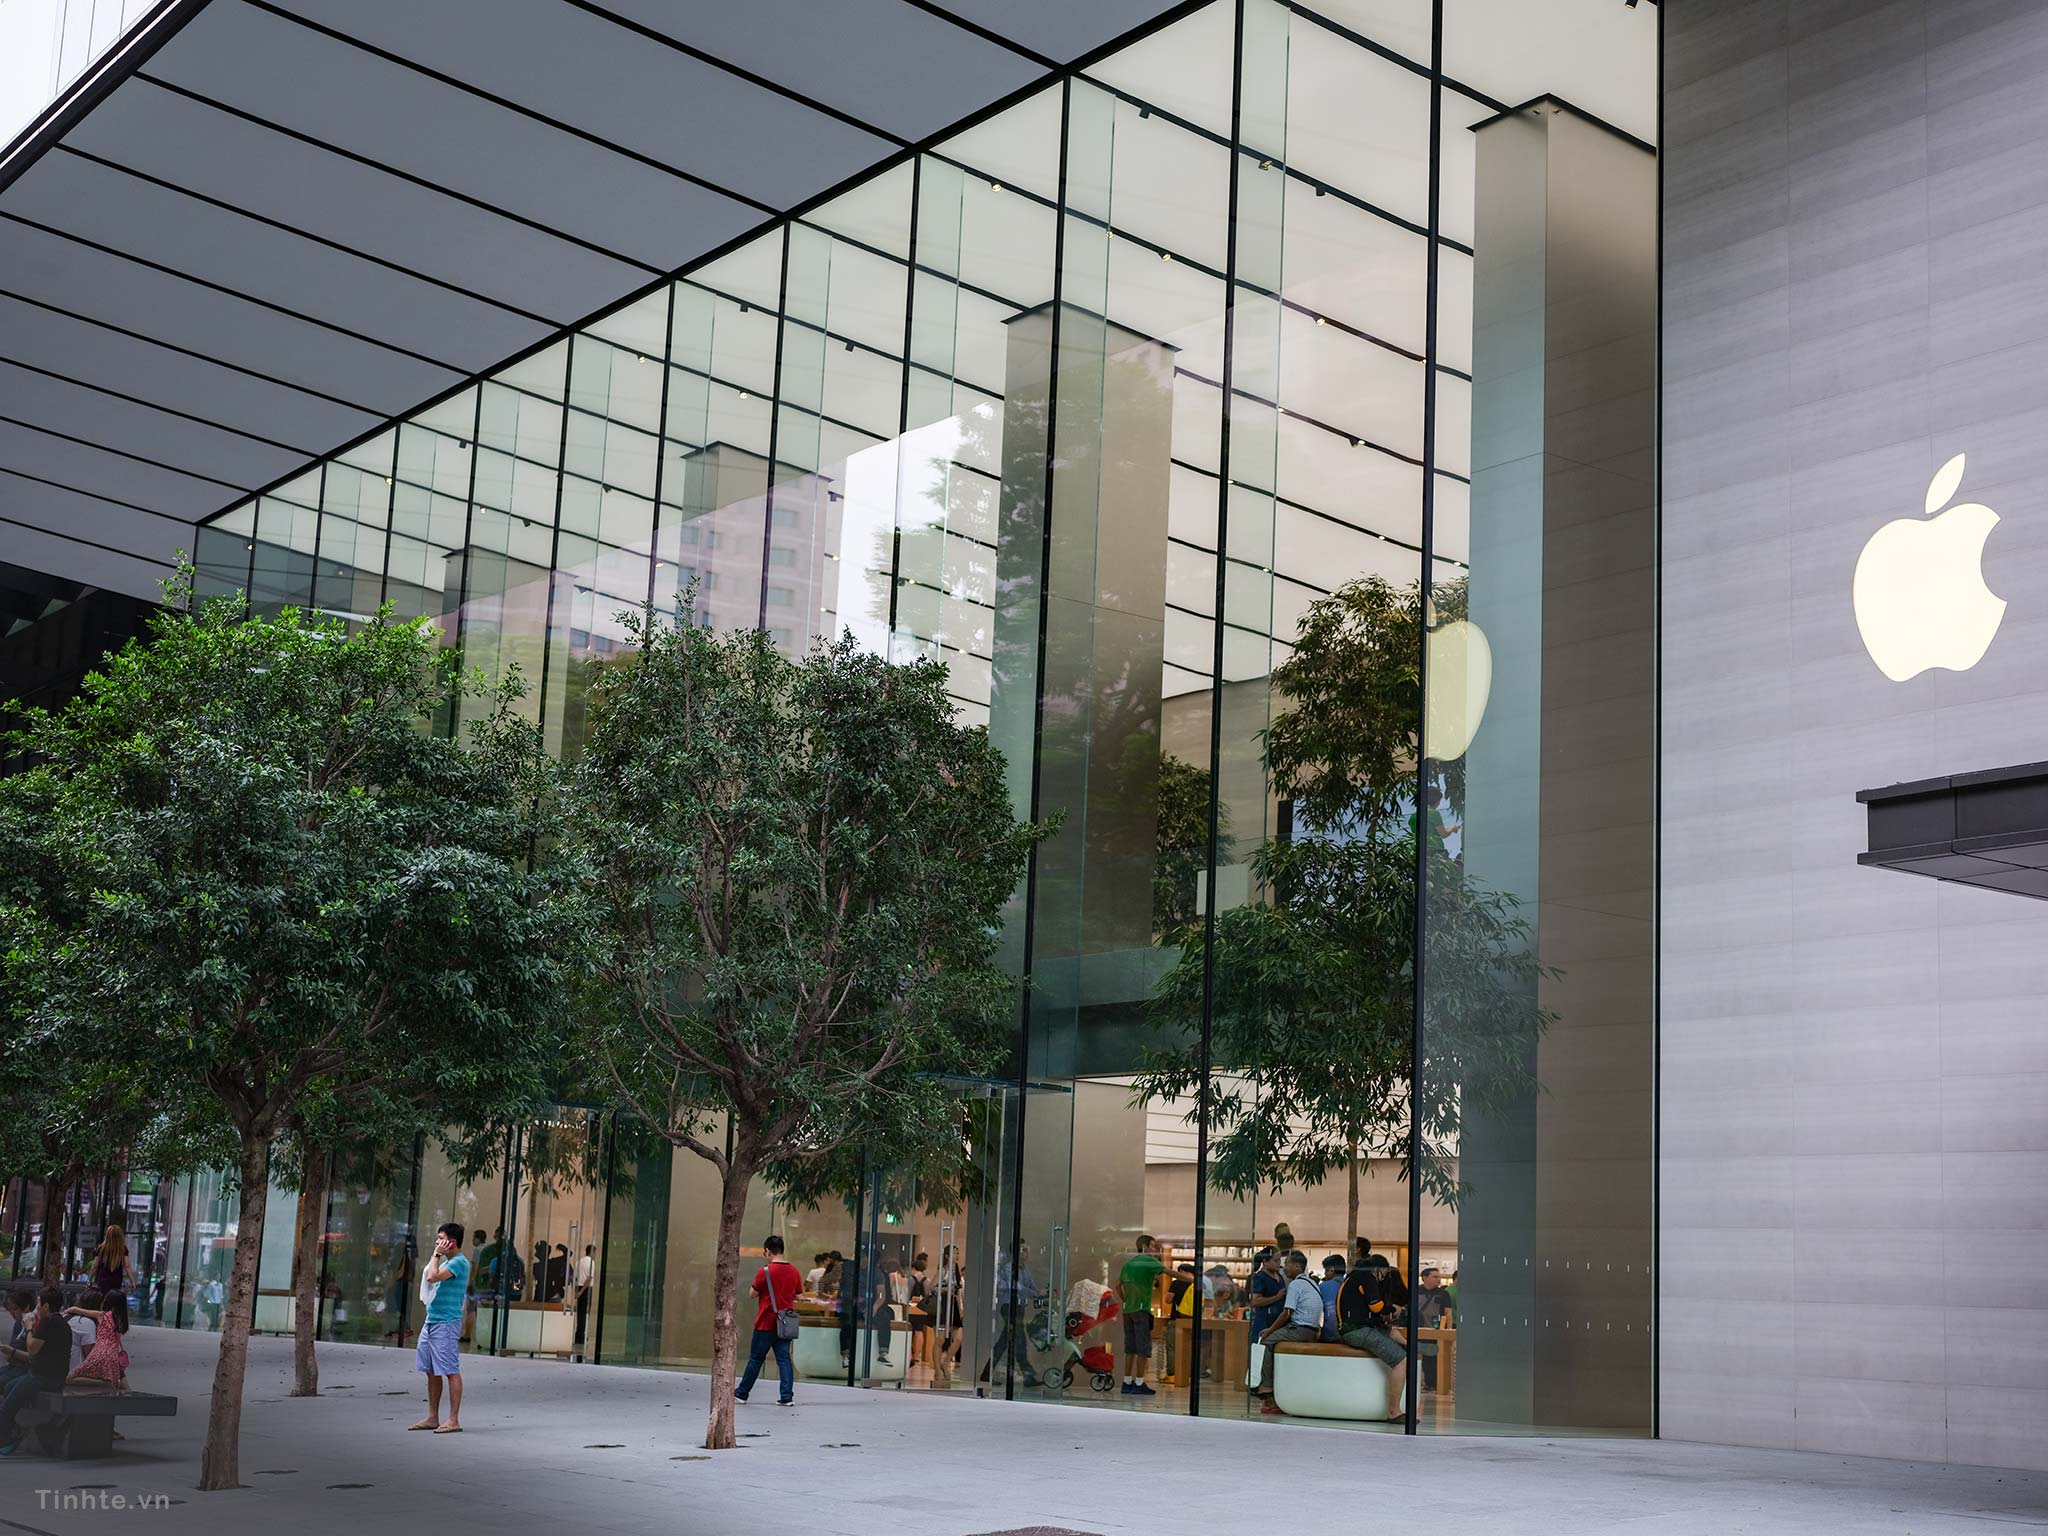 Apple-Store-Singapore.jpg